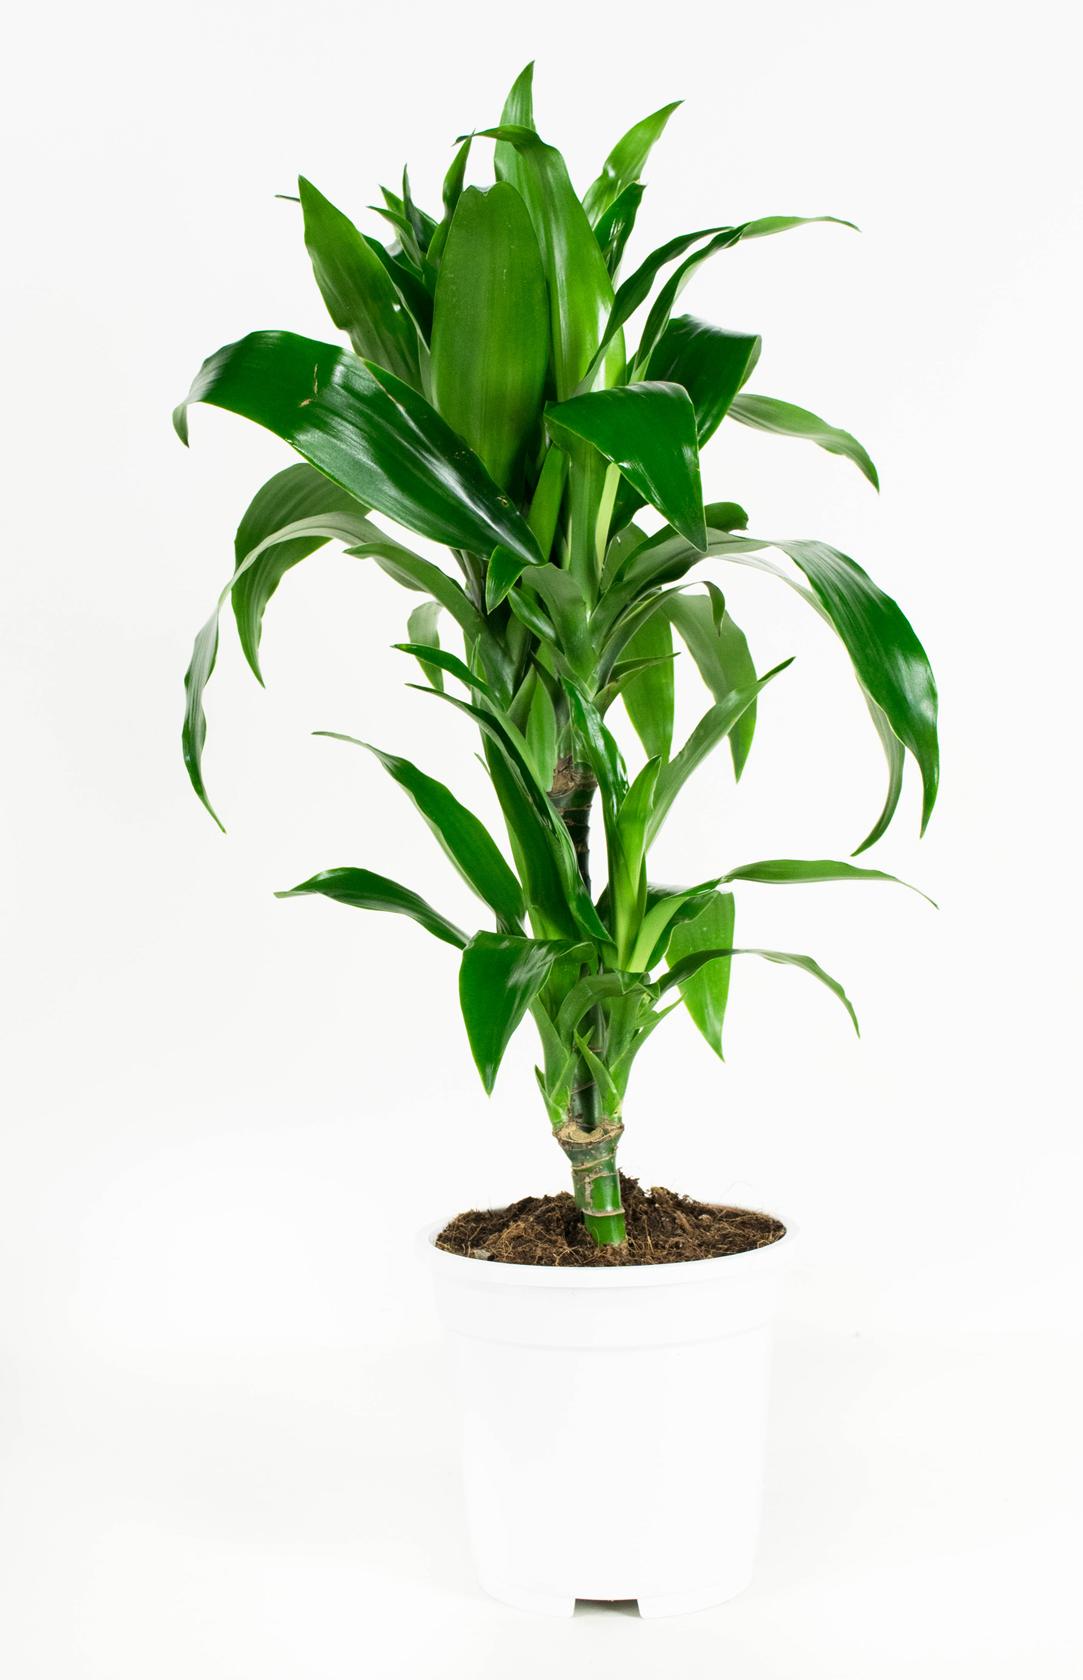 2 stuks Drakenbloedboom - Dracaena fragans janet craig 65cm hoog